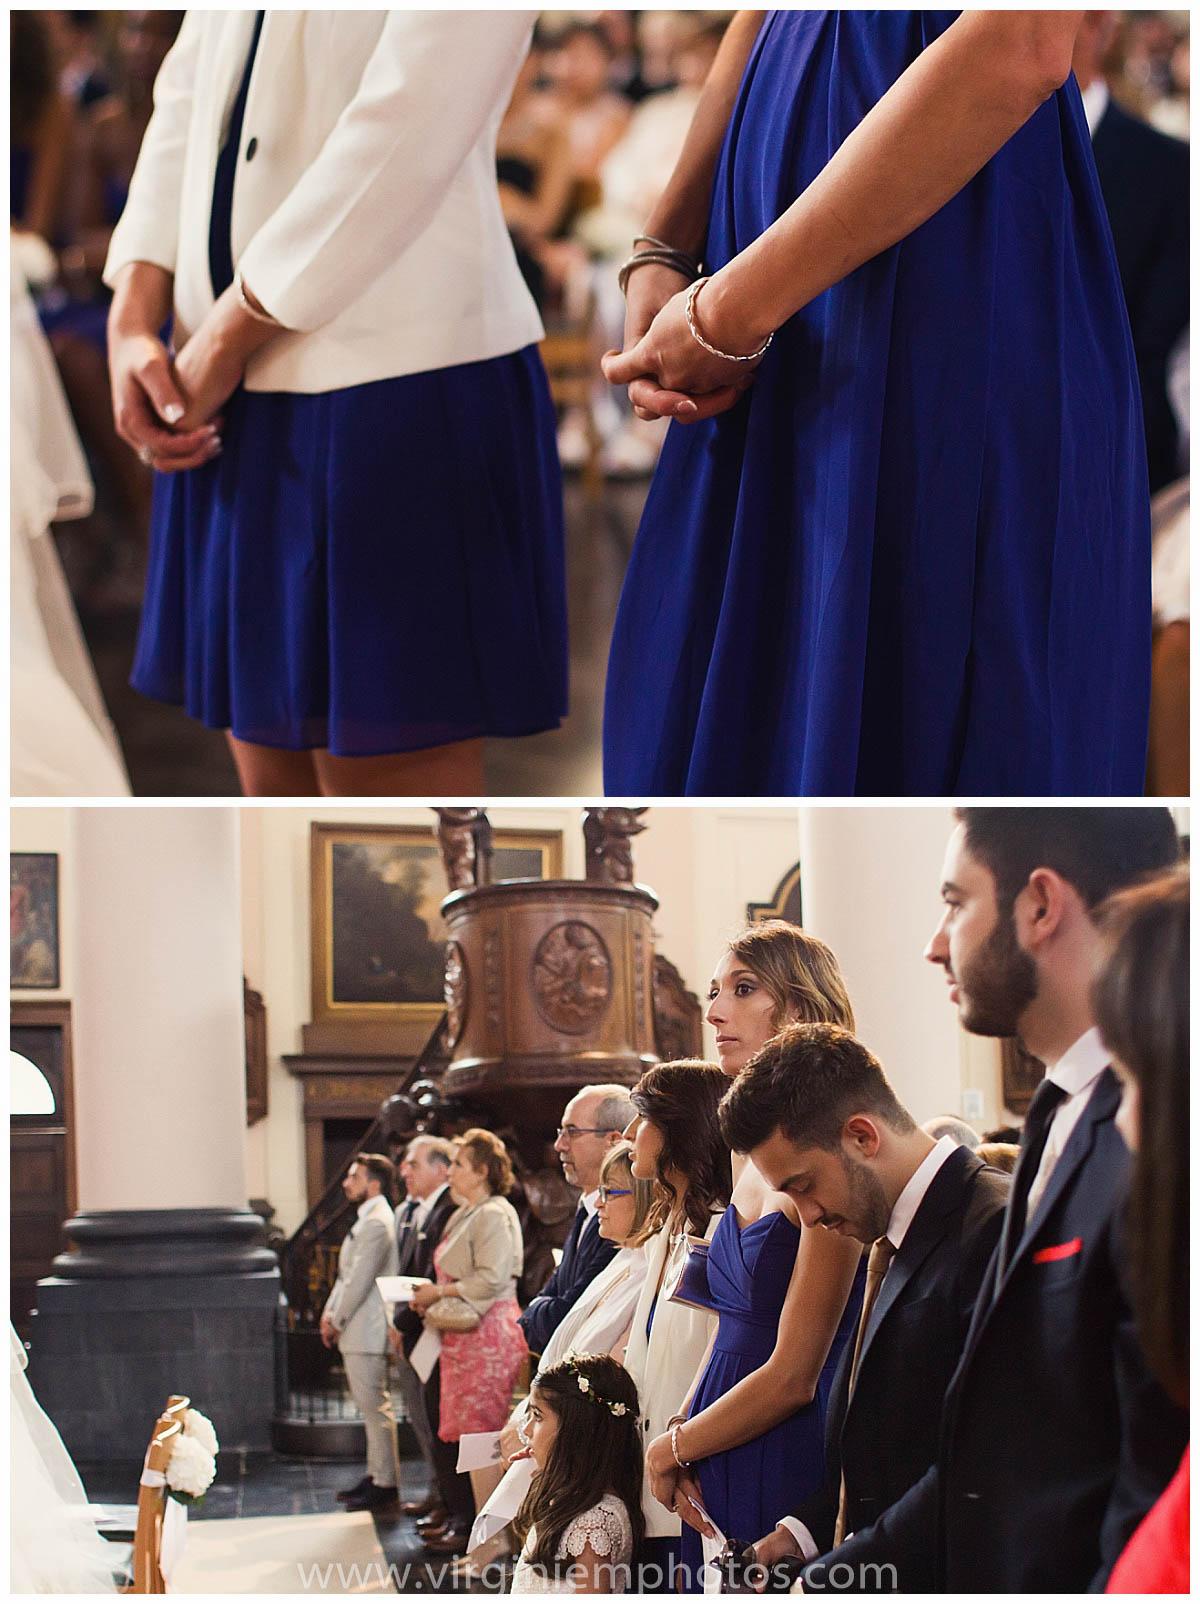 Virginie M. Photos-photographe mariage nord-Eglise (4)